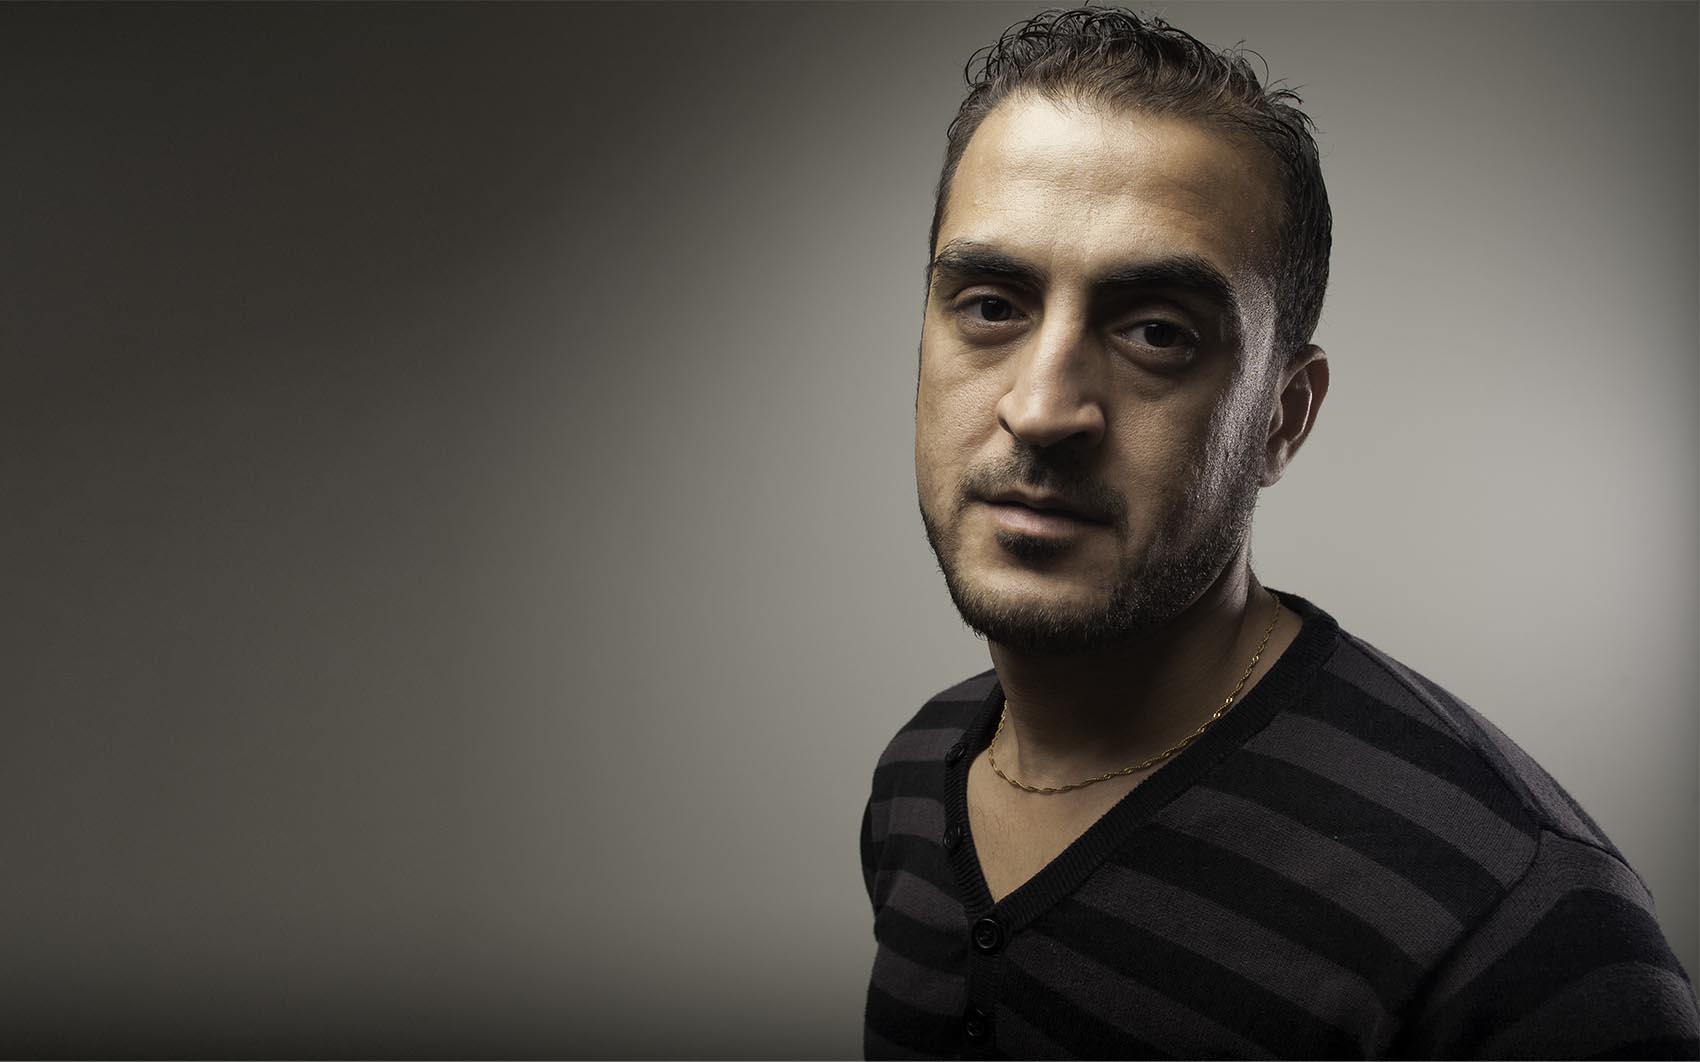 Ahmed002